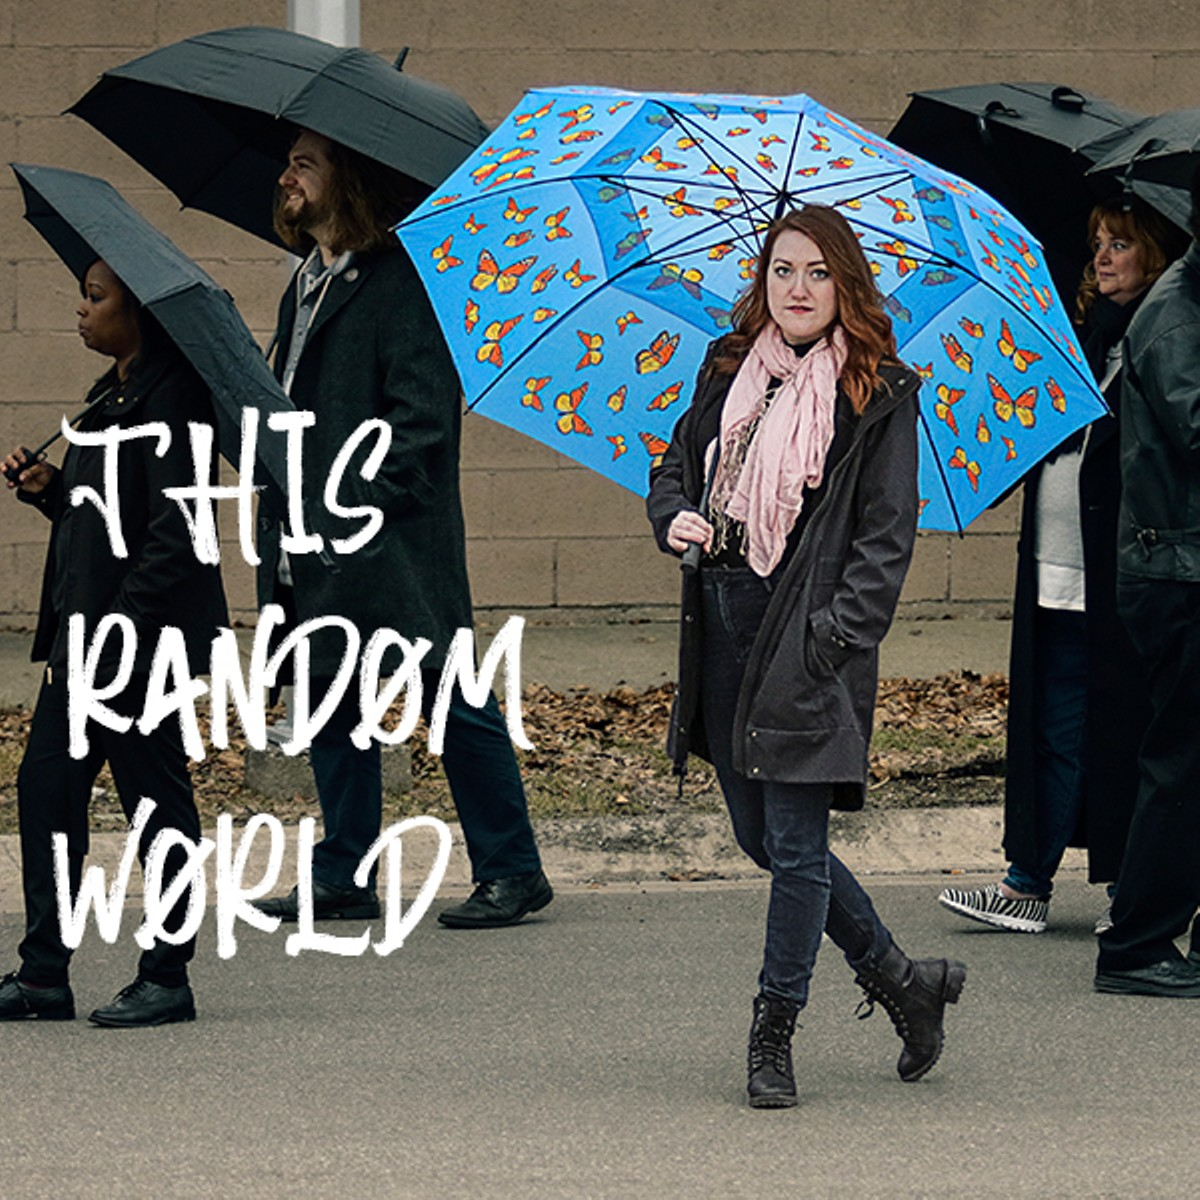 This Random World